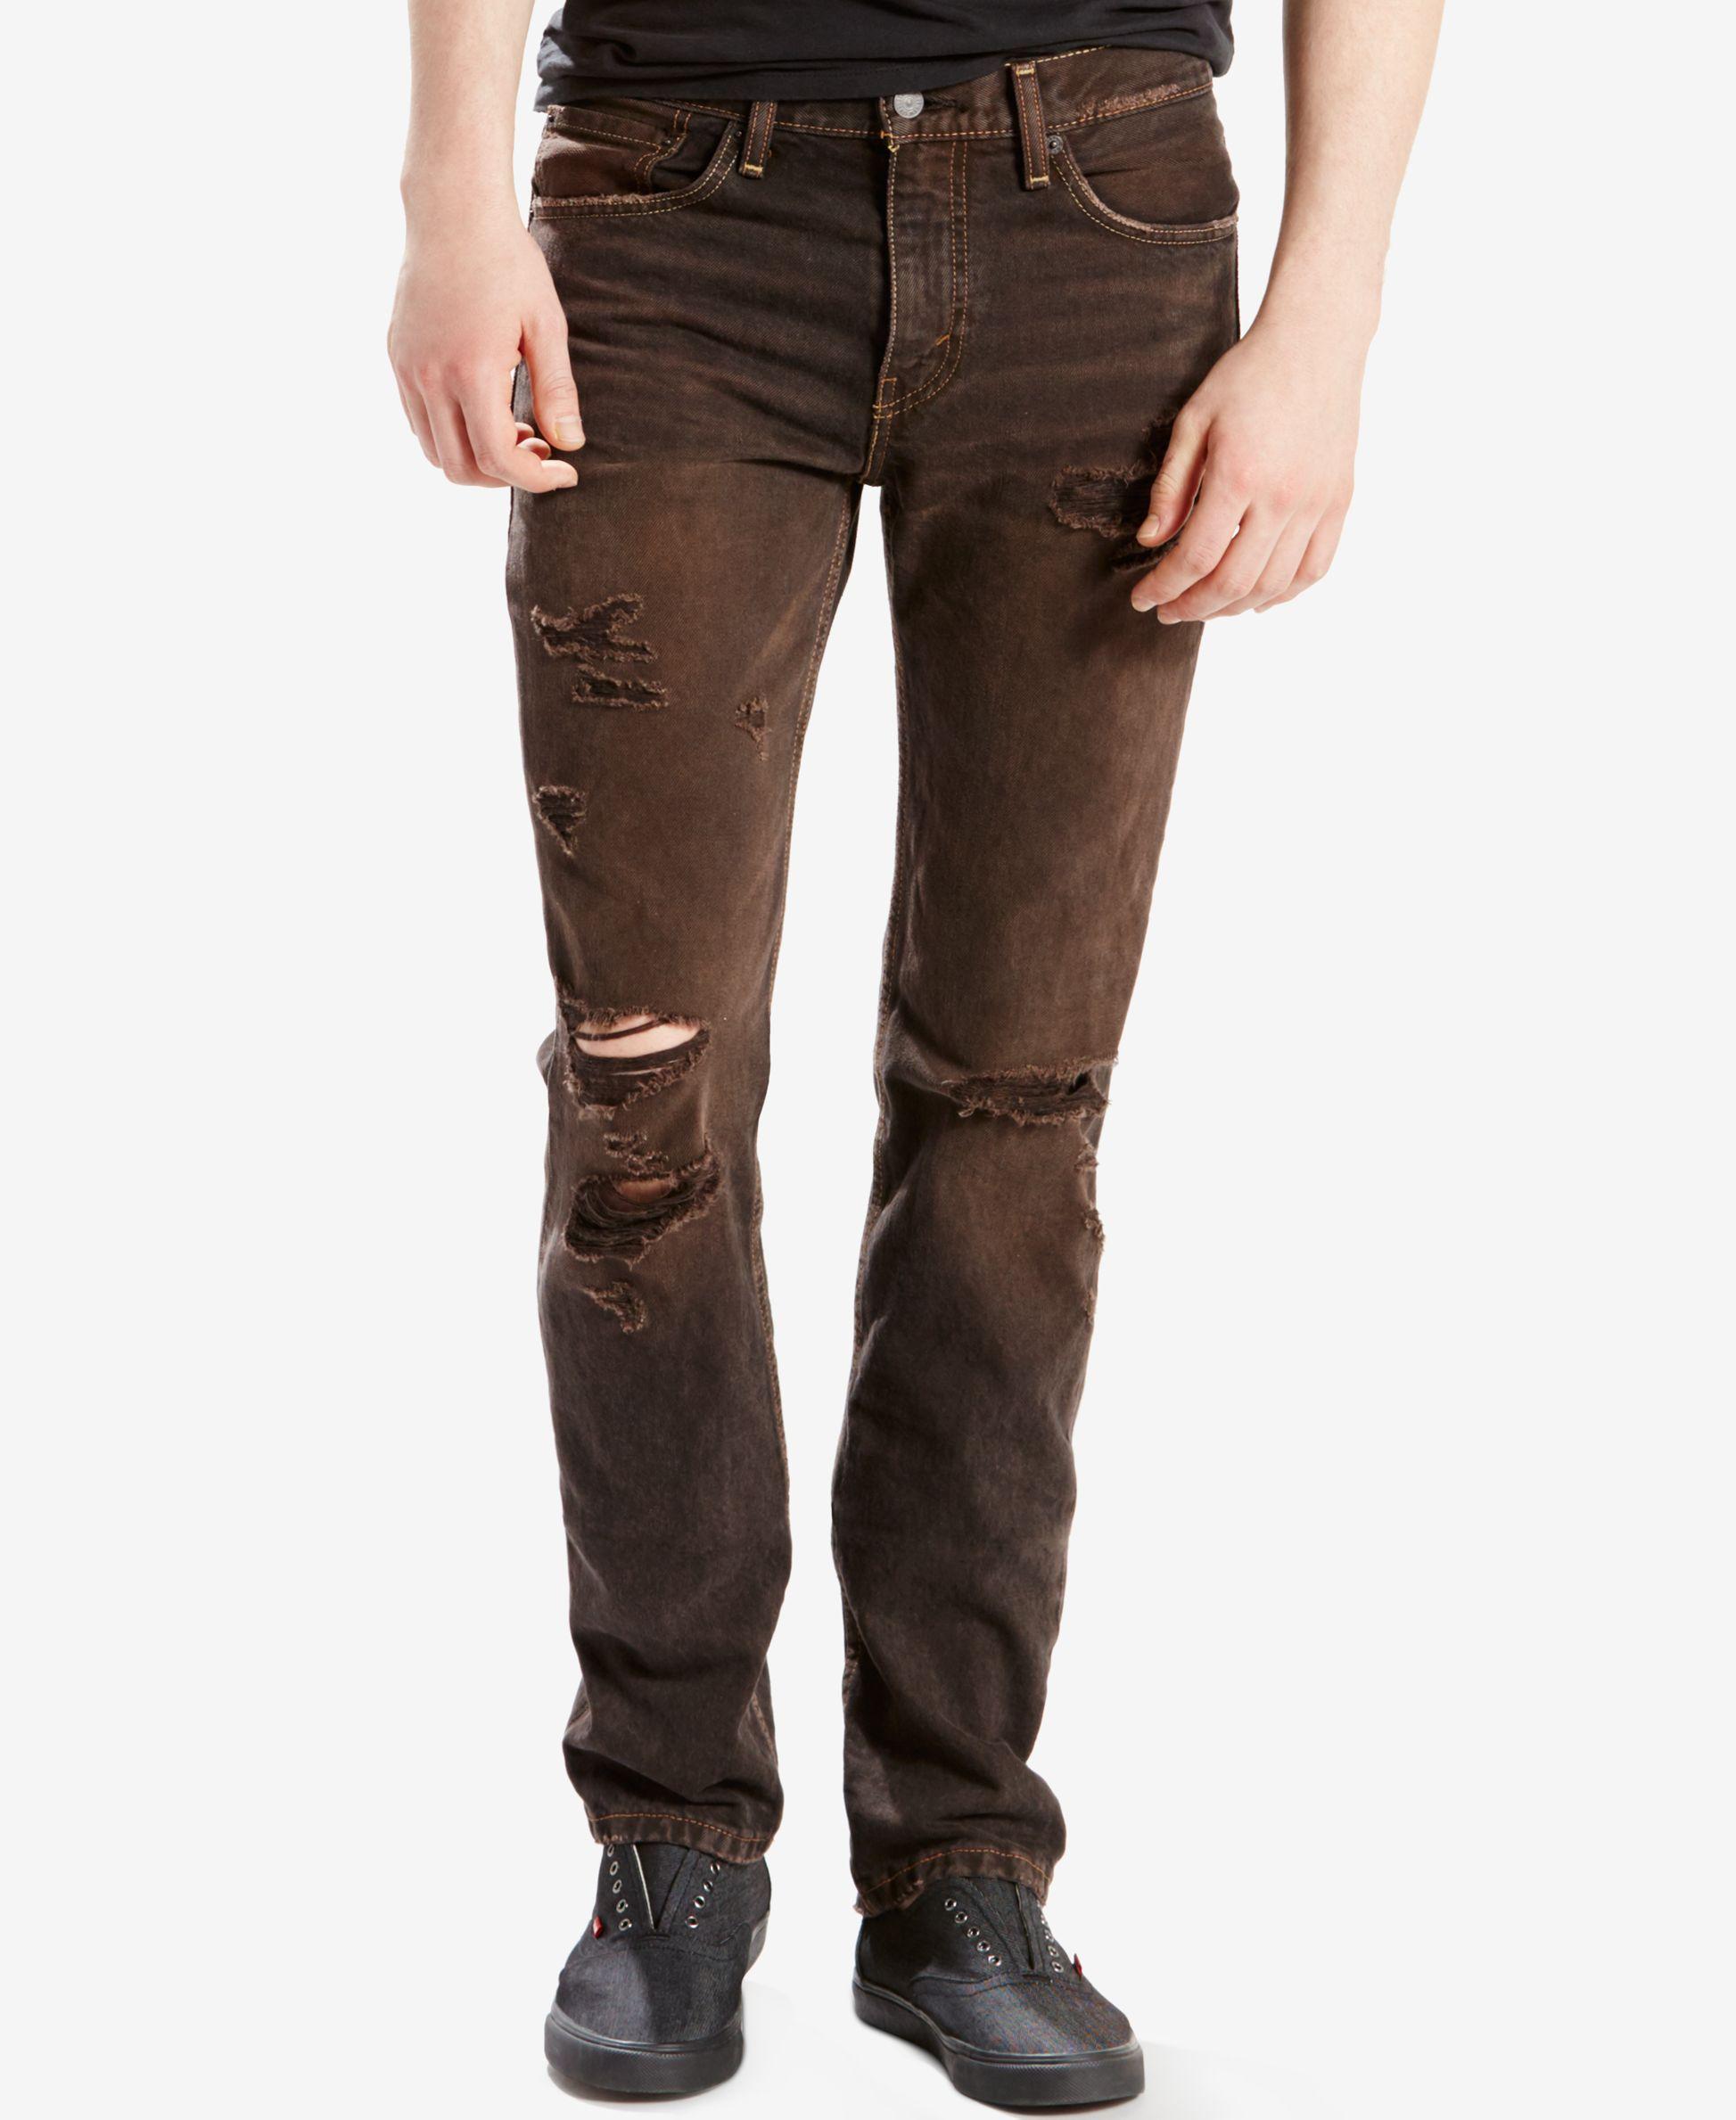 Levi's® Men's 511 Slim Fit Jeans   Slim fit ripped jeans